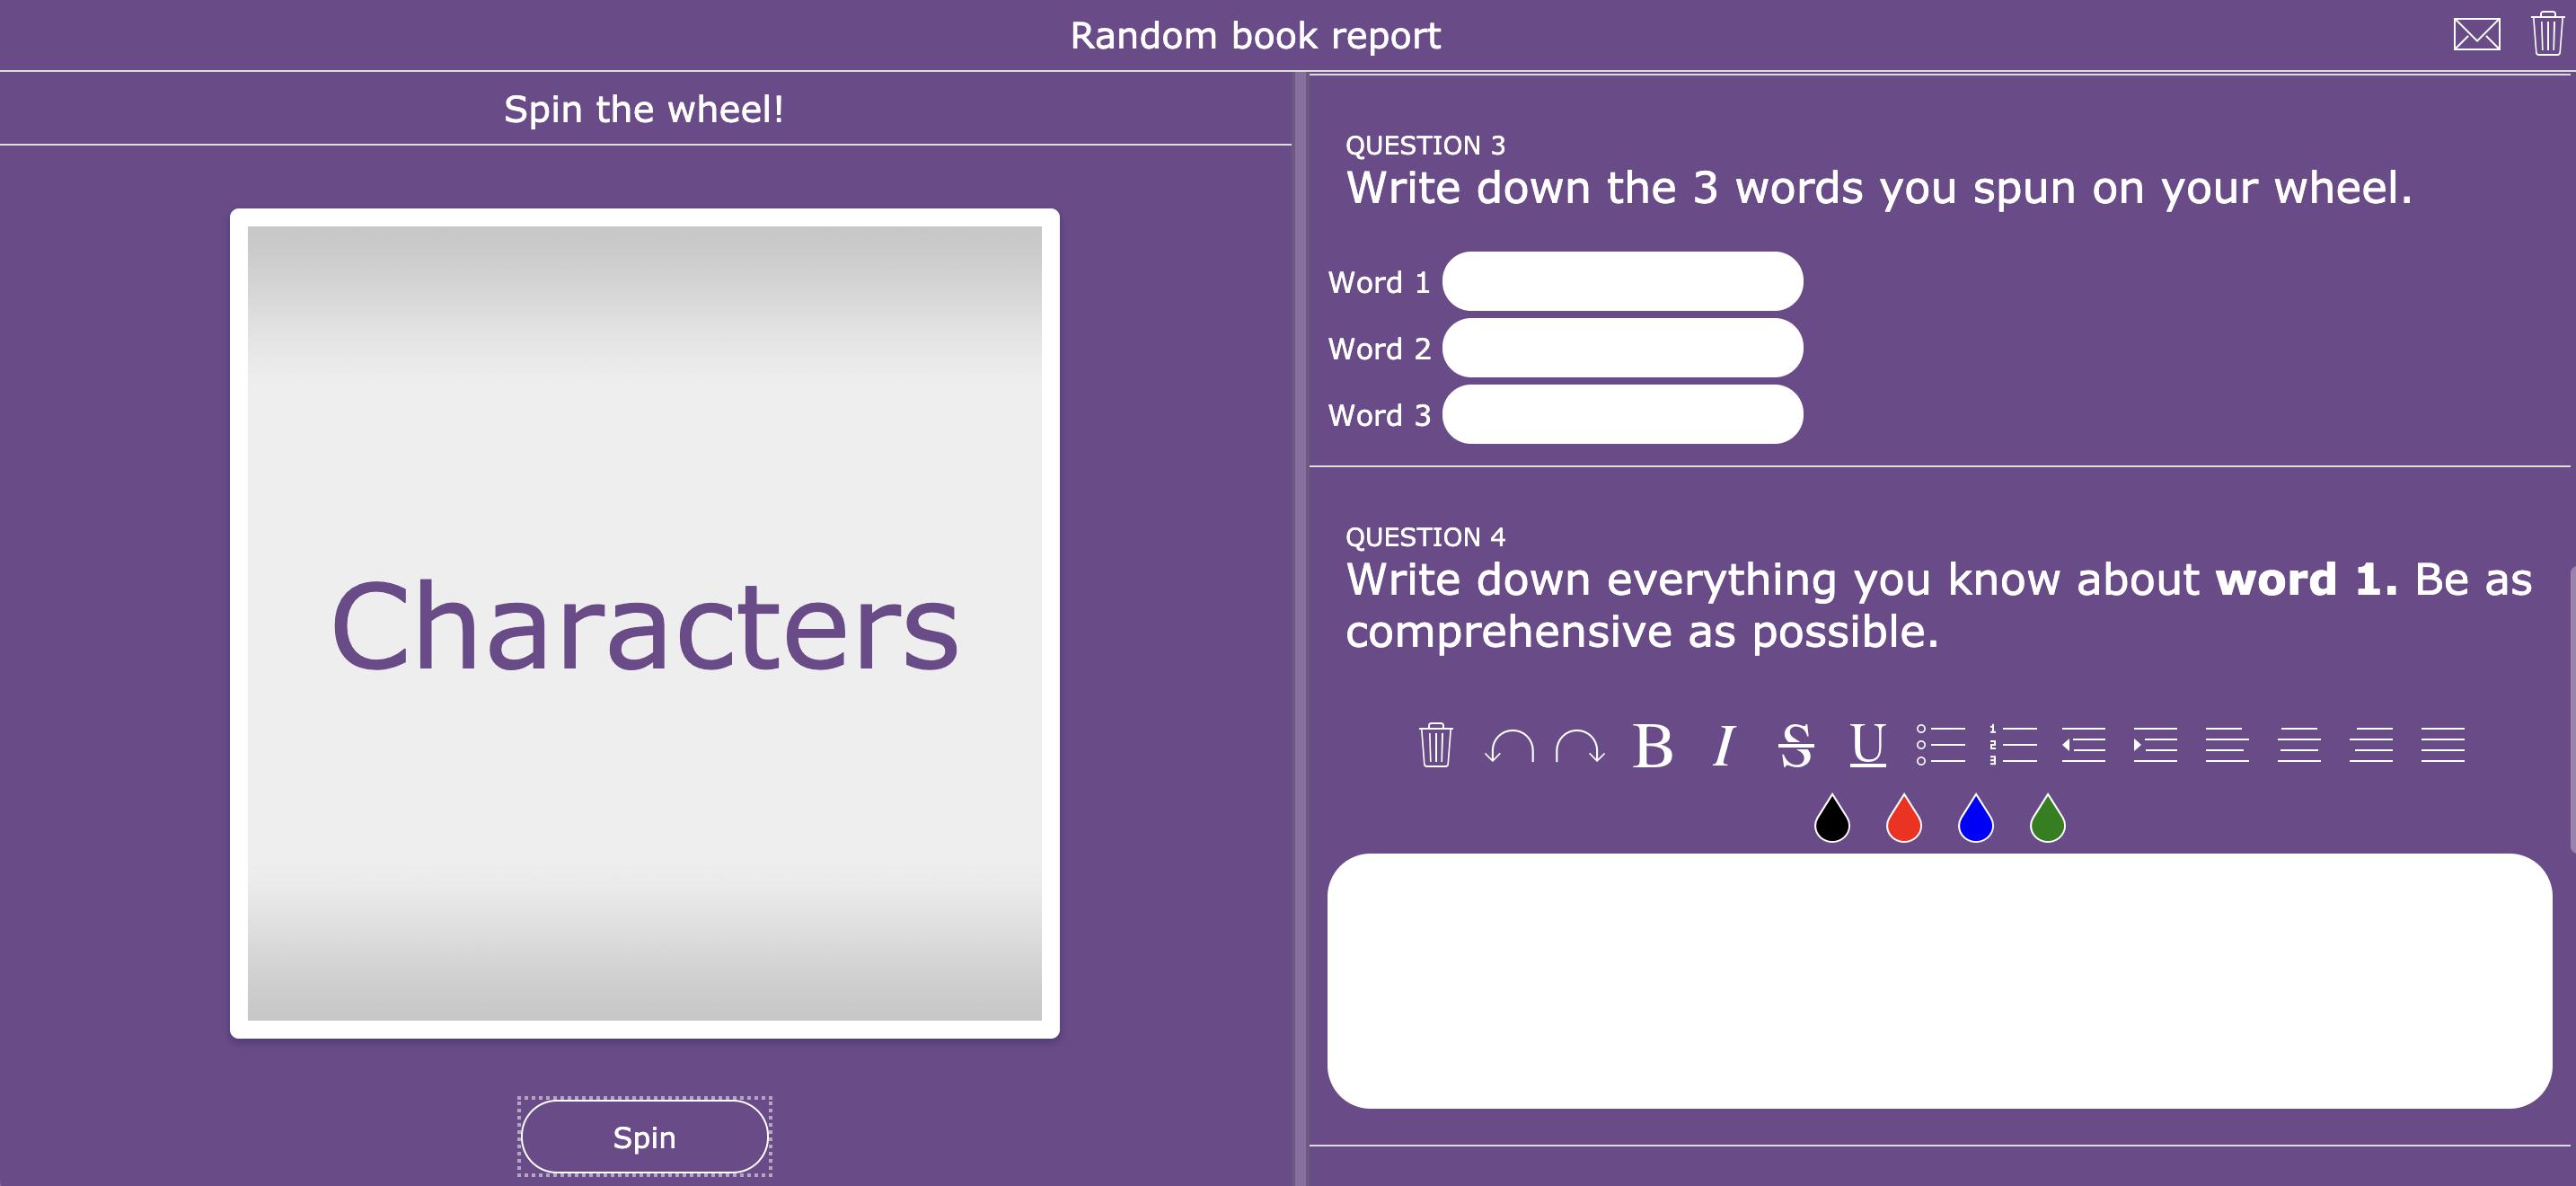 Creative book report - bookworm